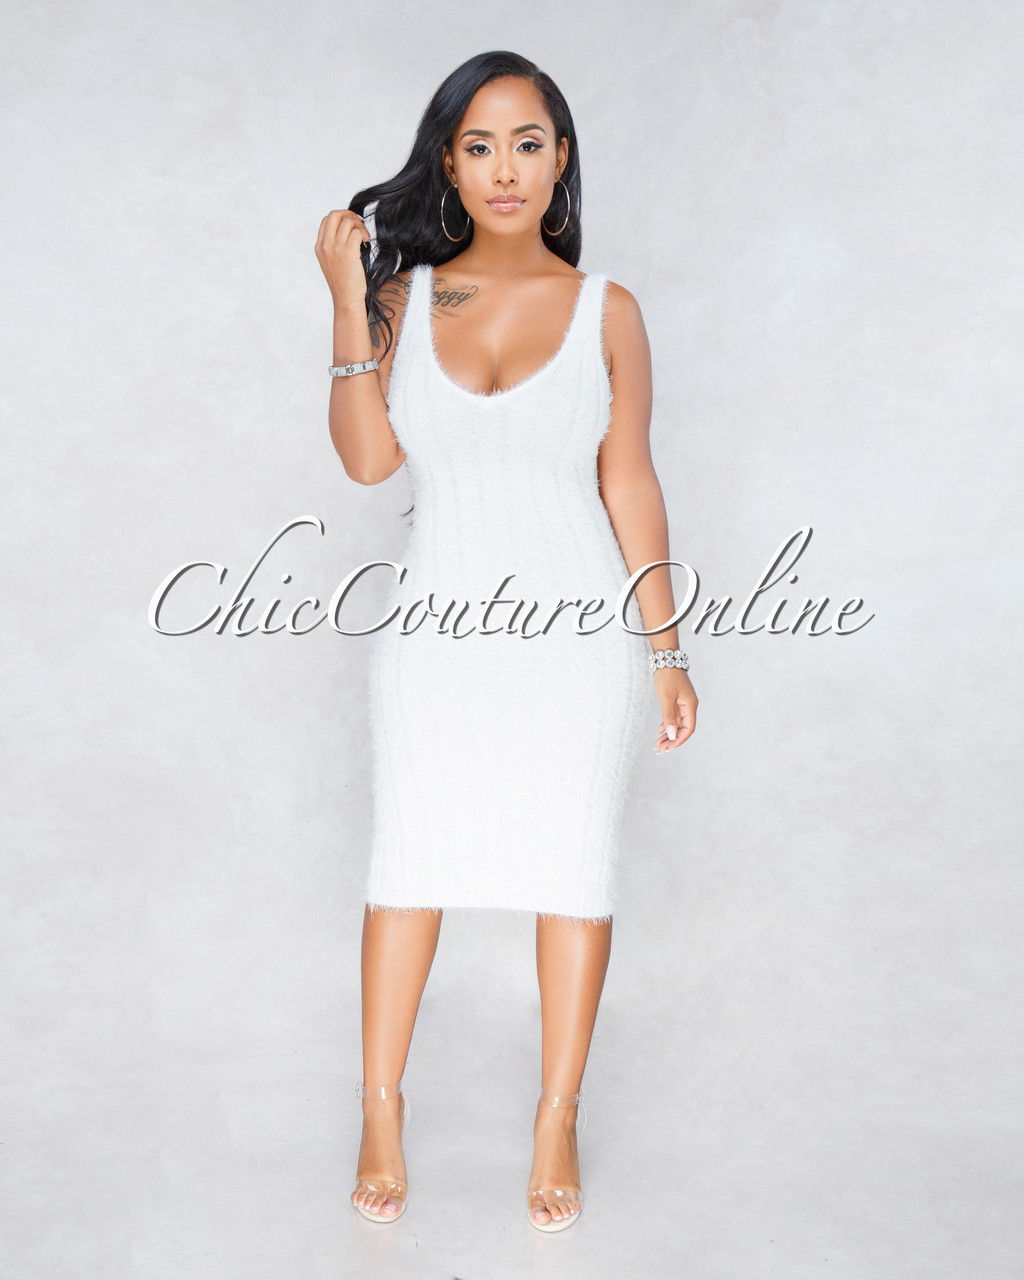 52eedf3a534 Adeline Off-White Ribbed Fuzzy Midi Dress. Price   45.00. Image 1